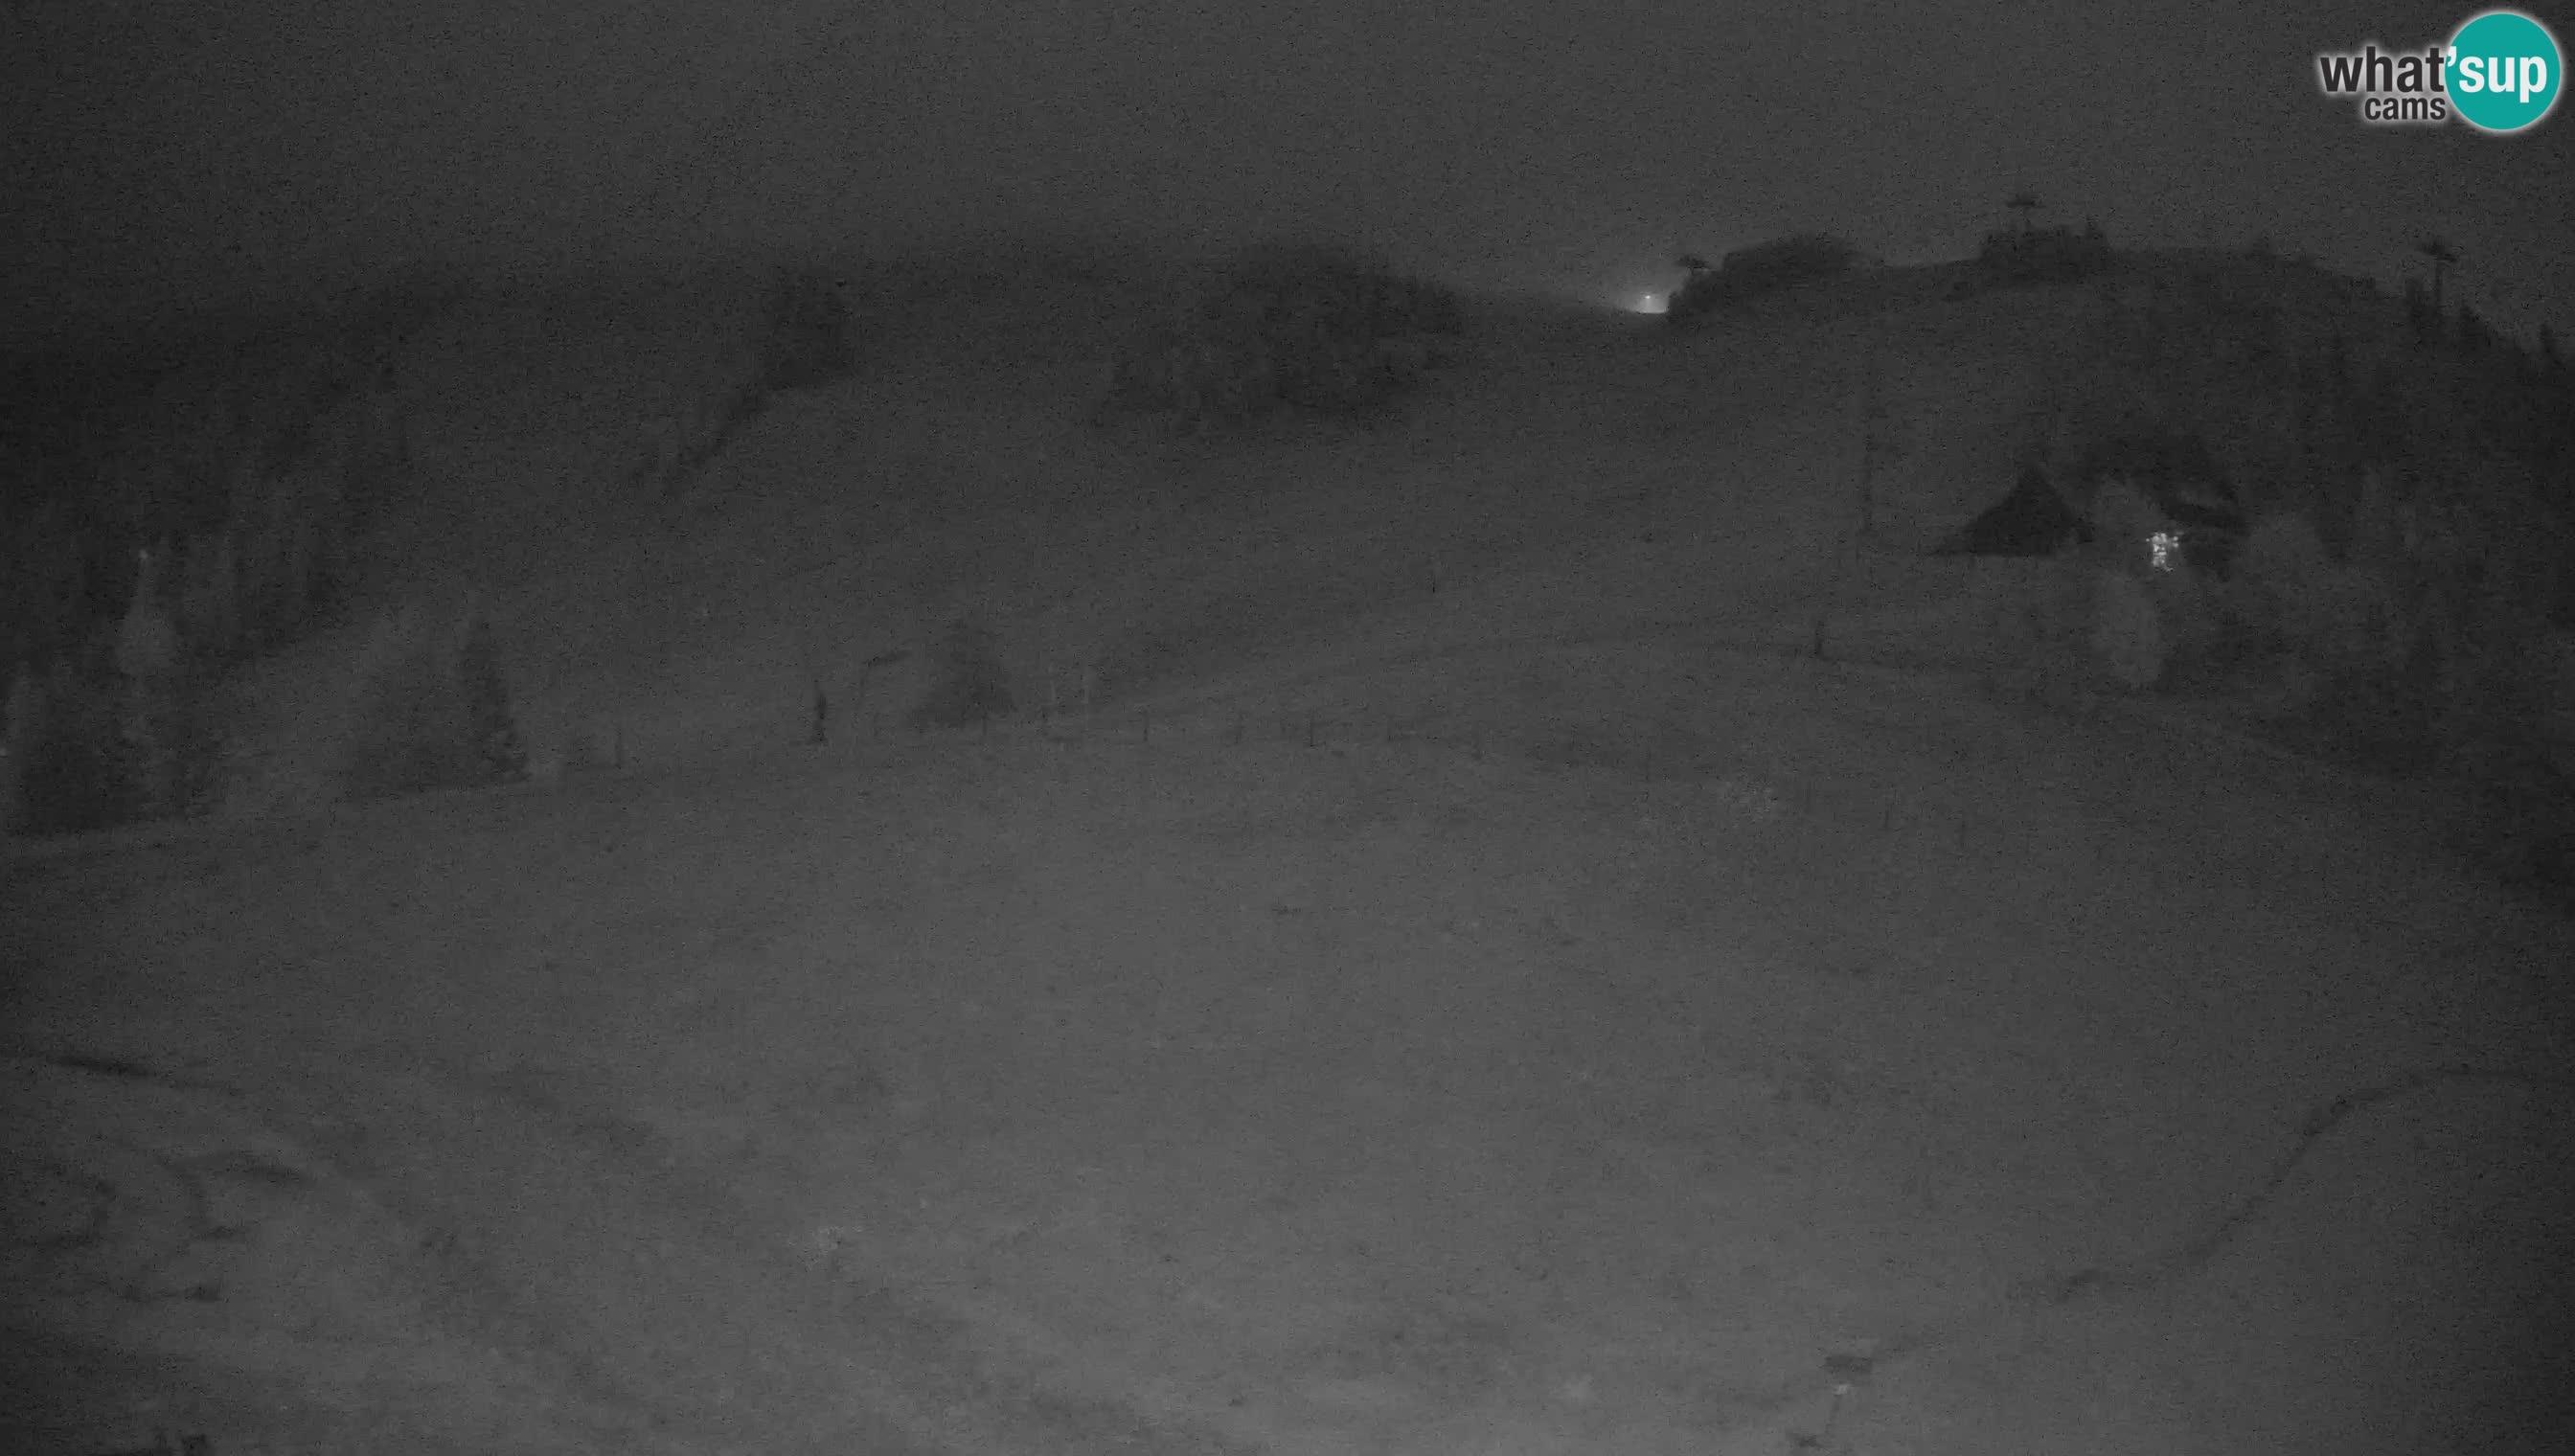 Krvavec Webcam Motorized – Ski resort